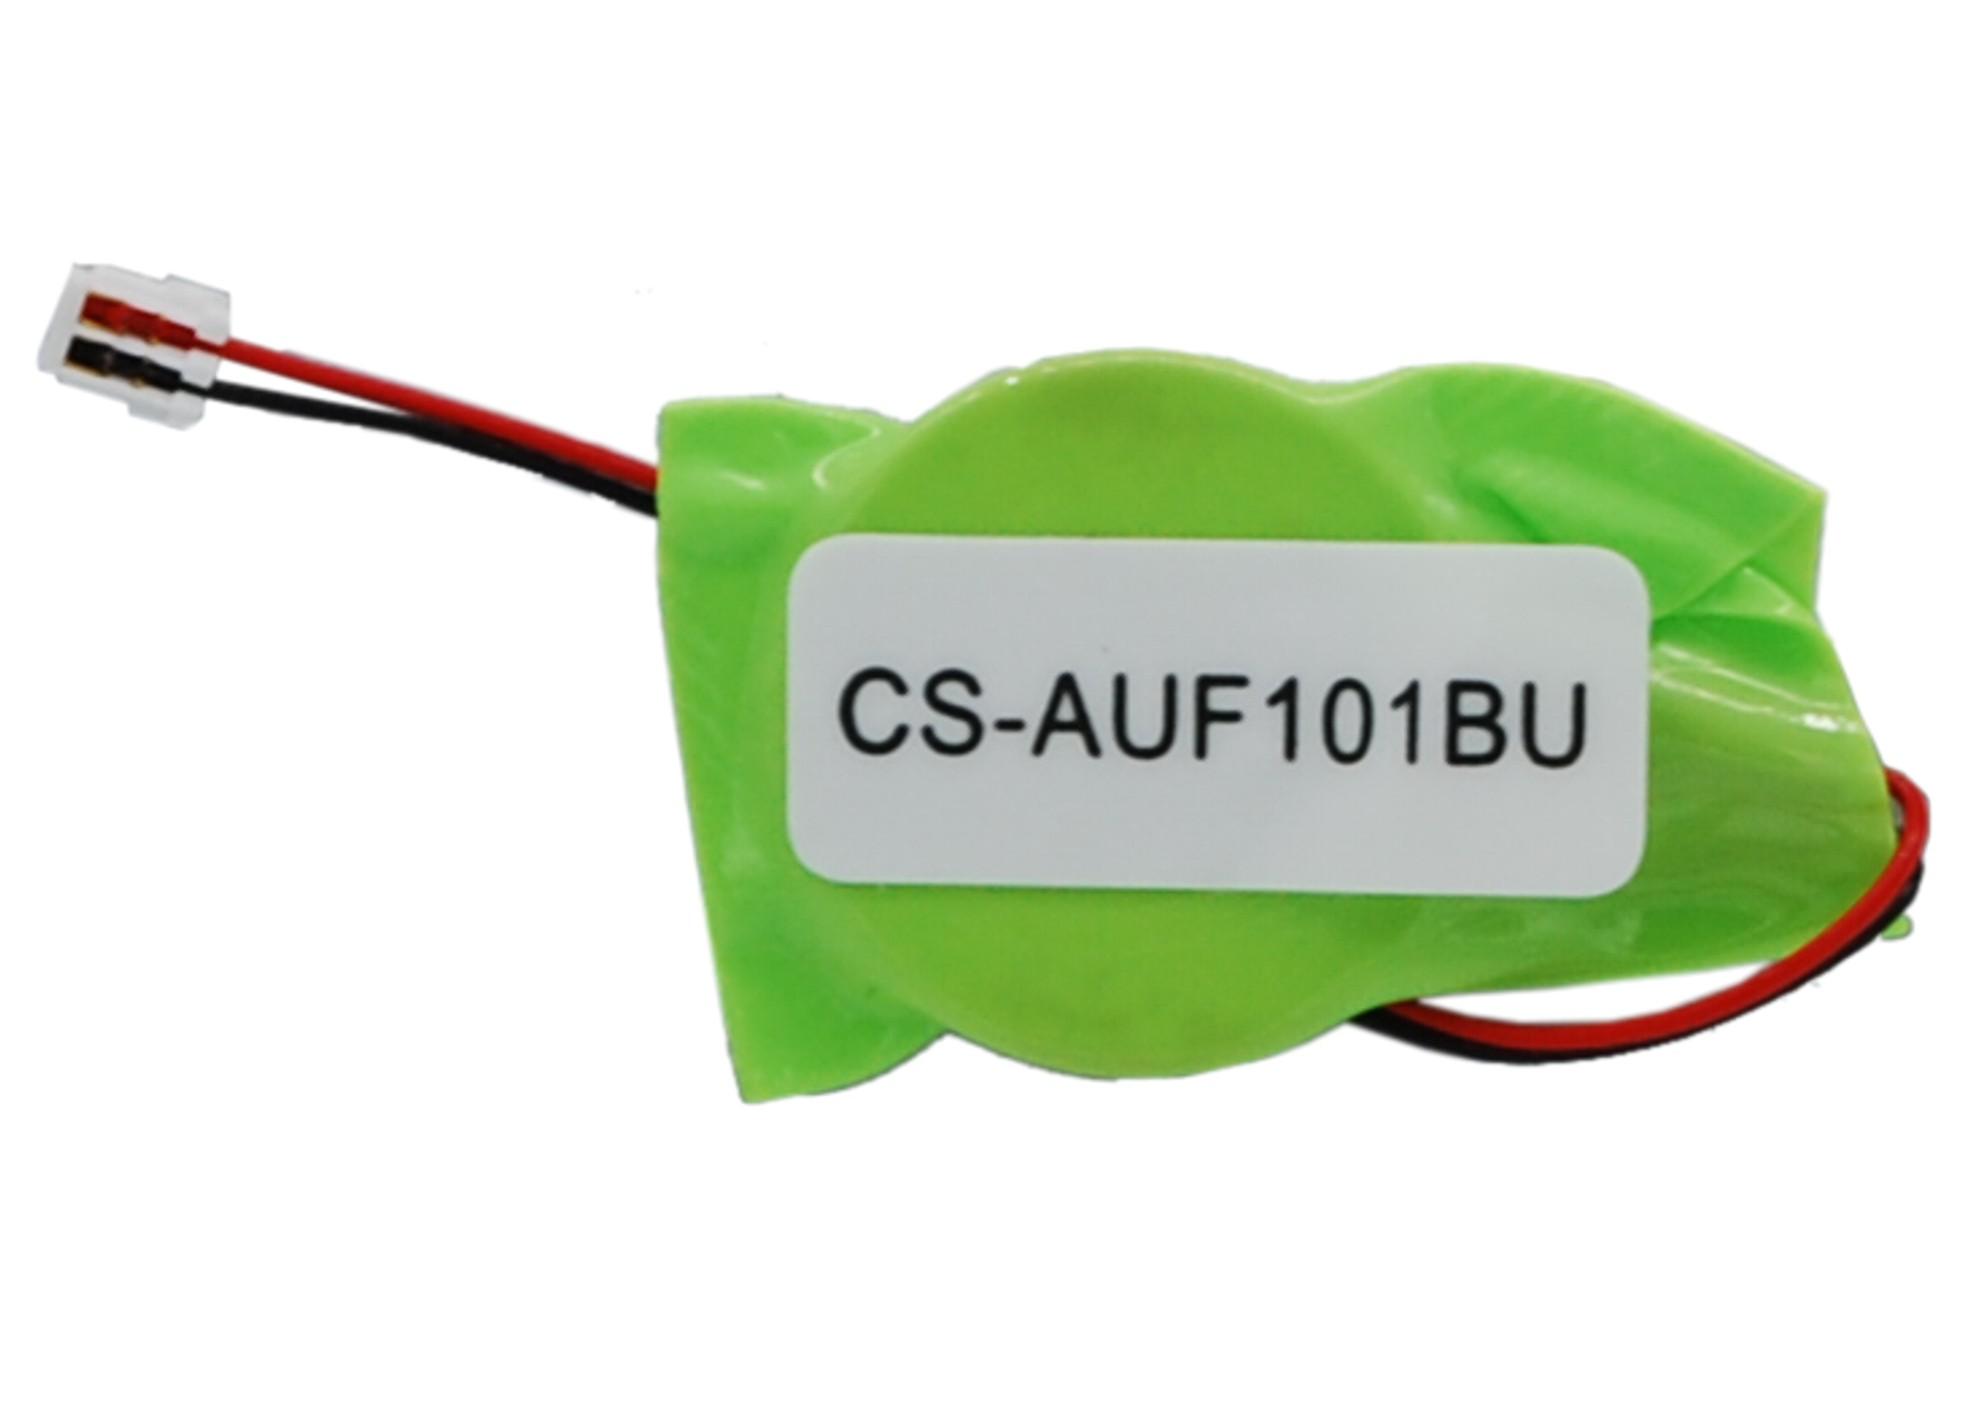 Cameron Sino baterie cmos pro ASUS Eee Pad Transformer TF101-1B027A 3V Li-ion 40mAh zelená - neoriginální